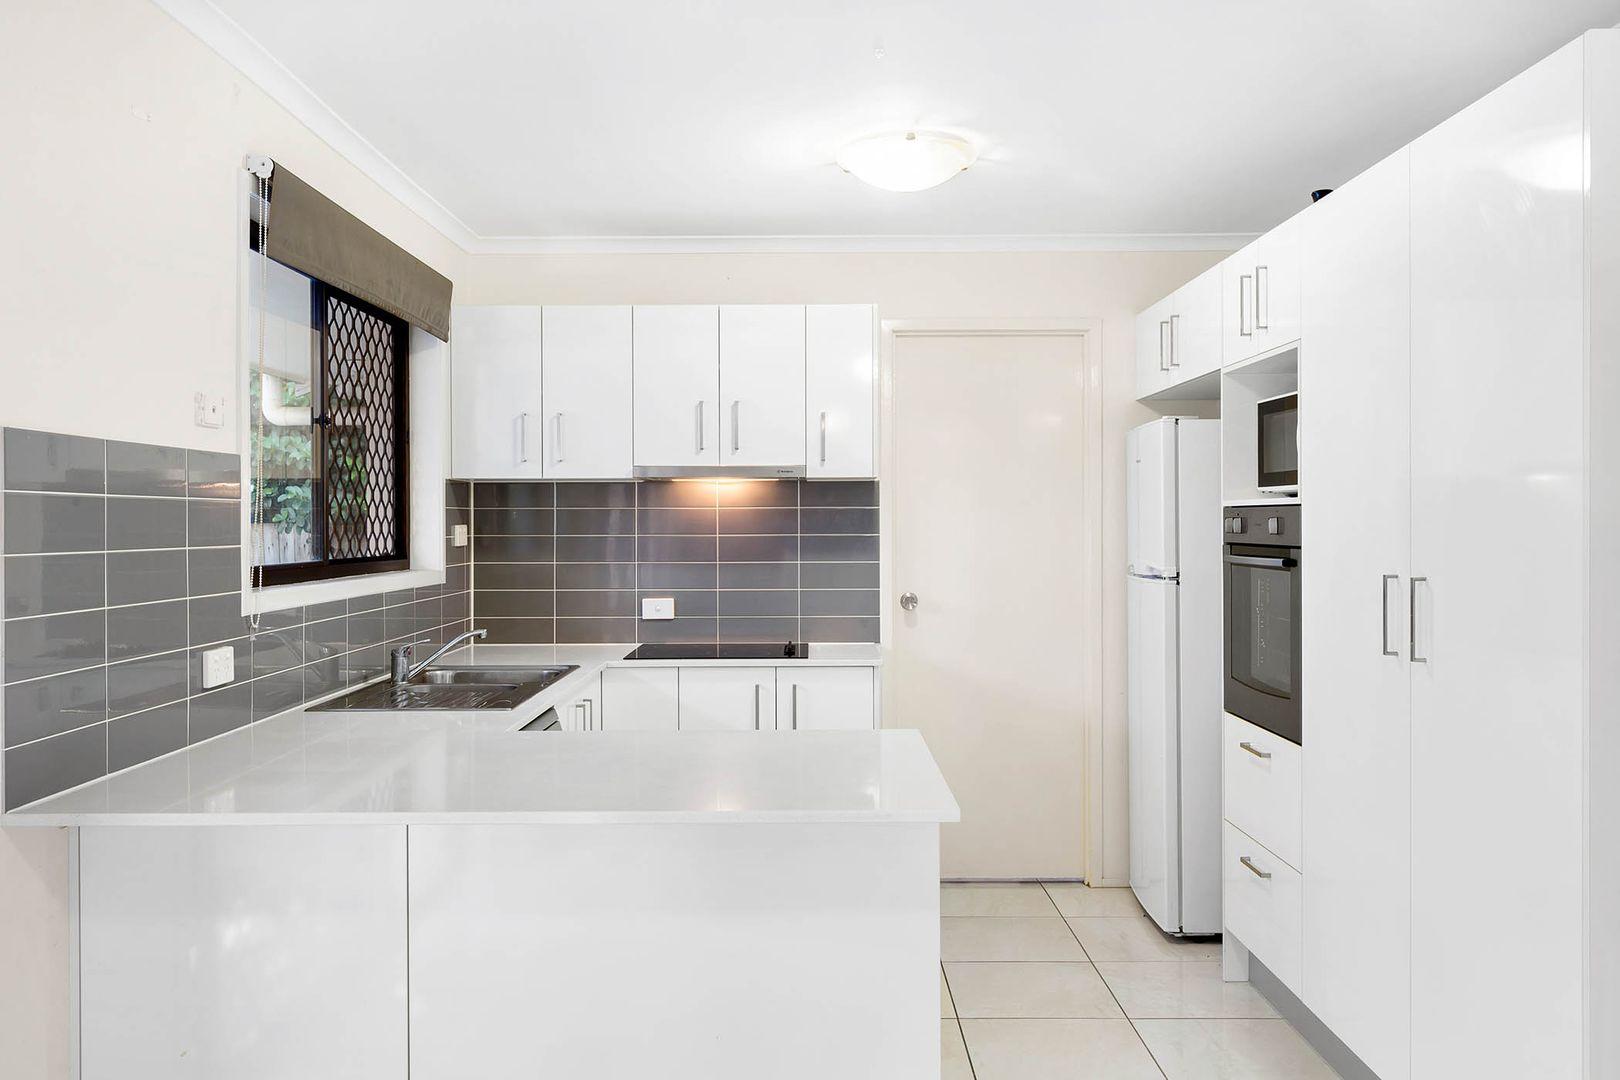 2/51 Lovegrove Street, Zillmere QLD 4034, Image 1